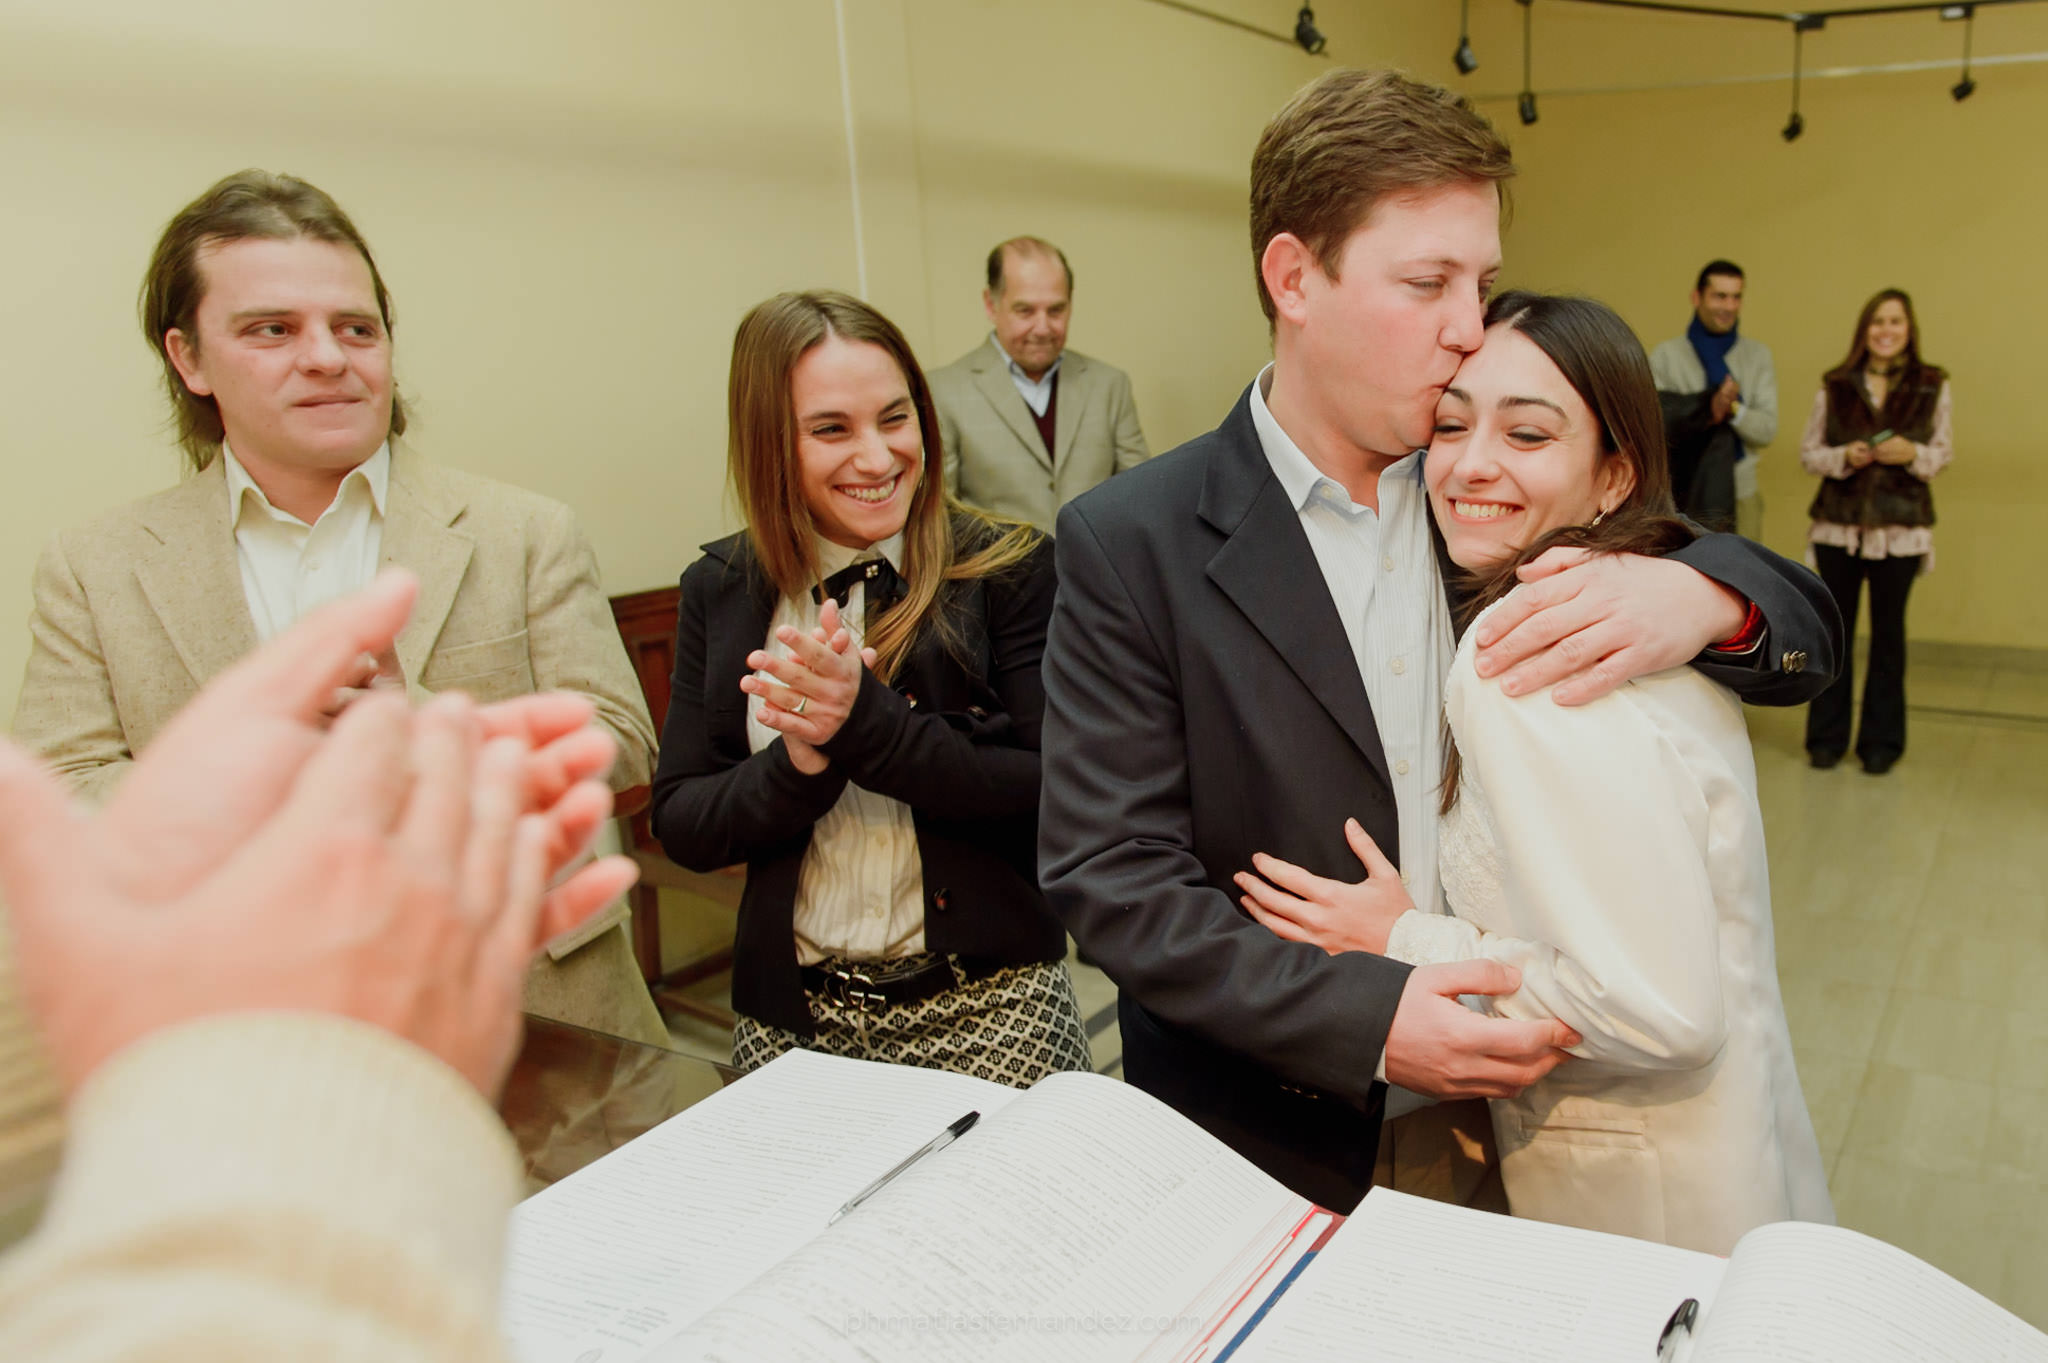 Guada & Fran - phmatiasfernandez - matias fernandez - matias fernandez fotografo de bodas